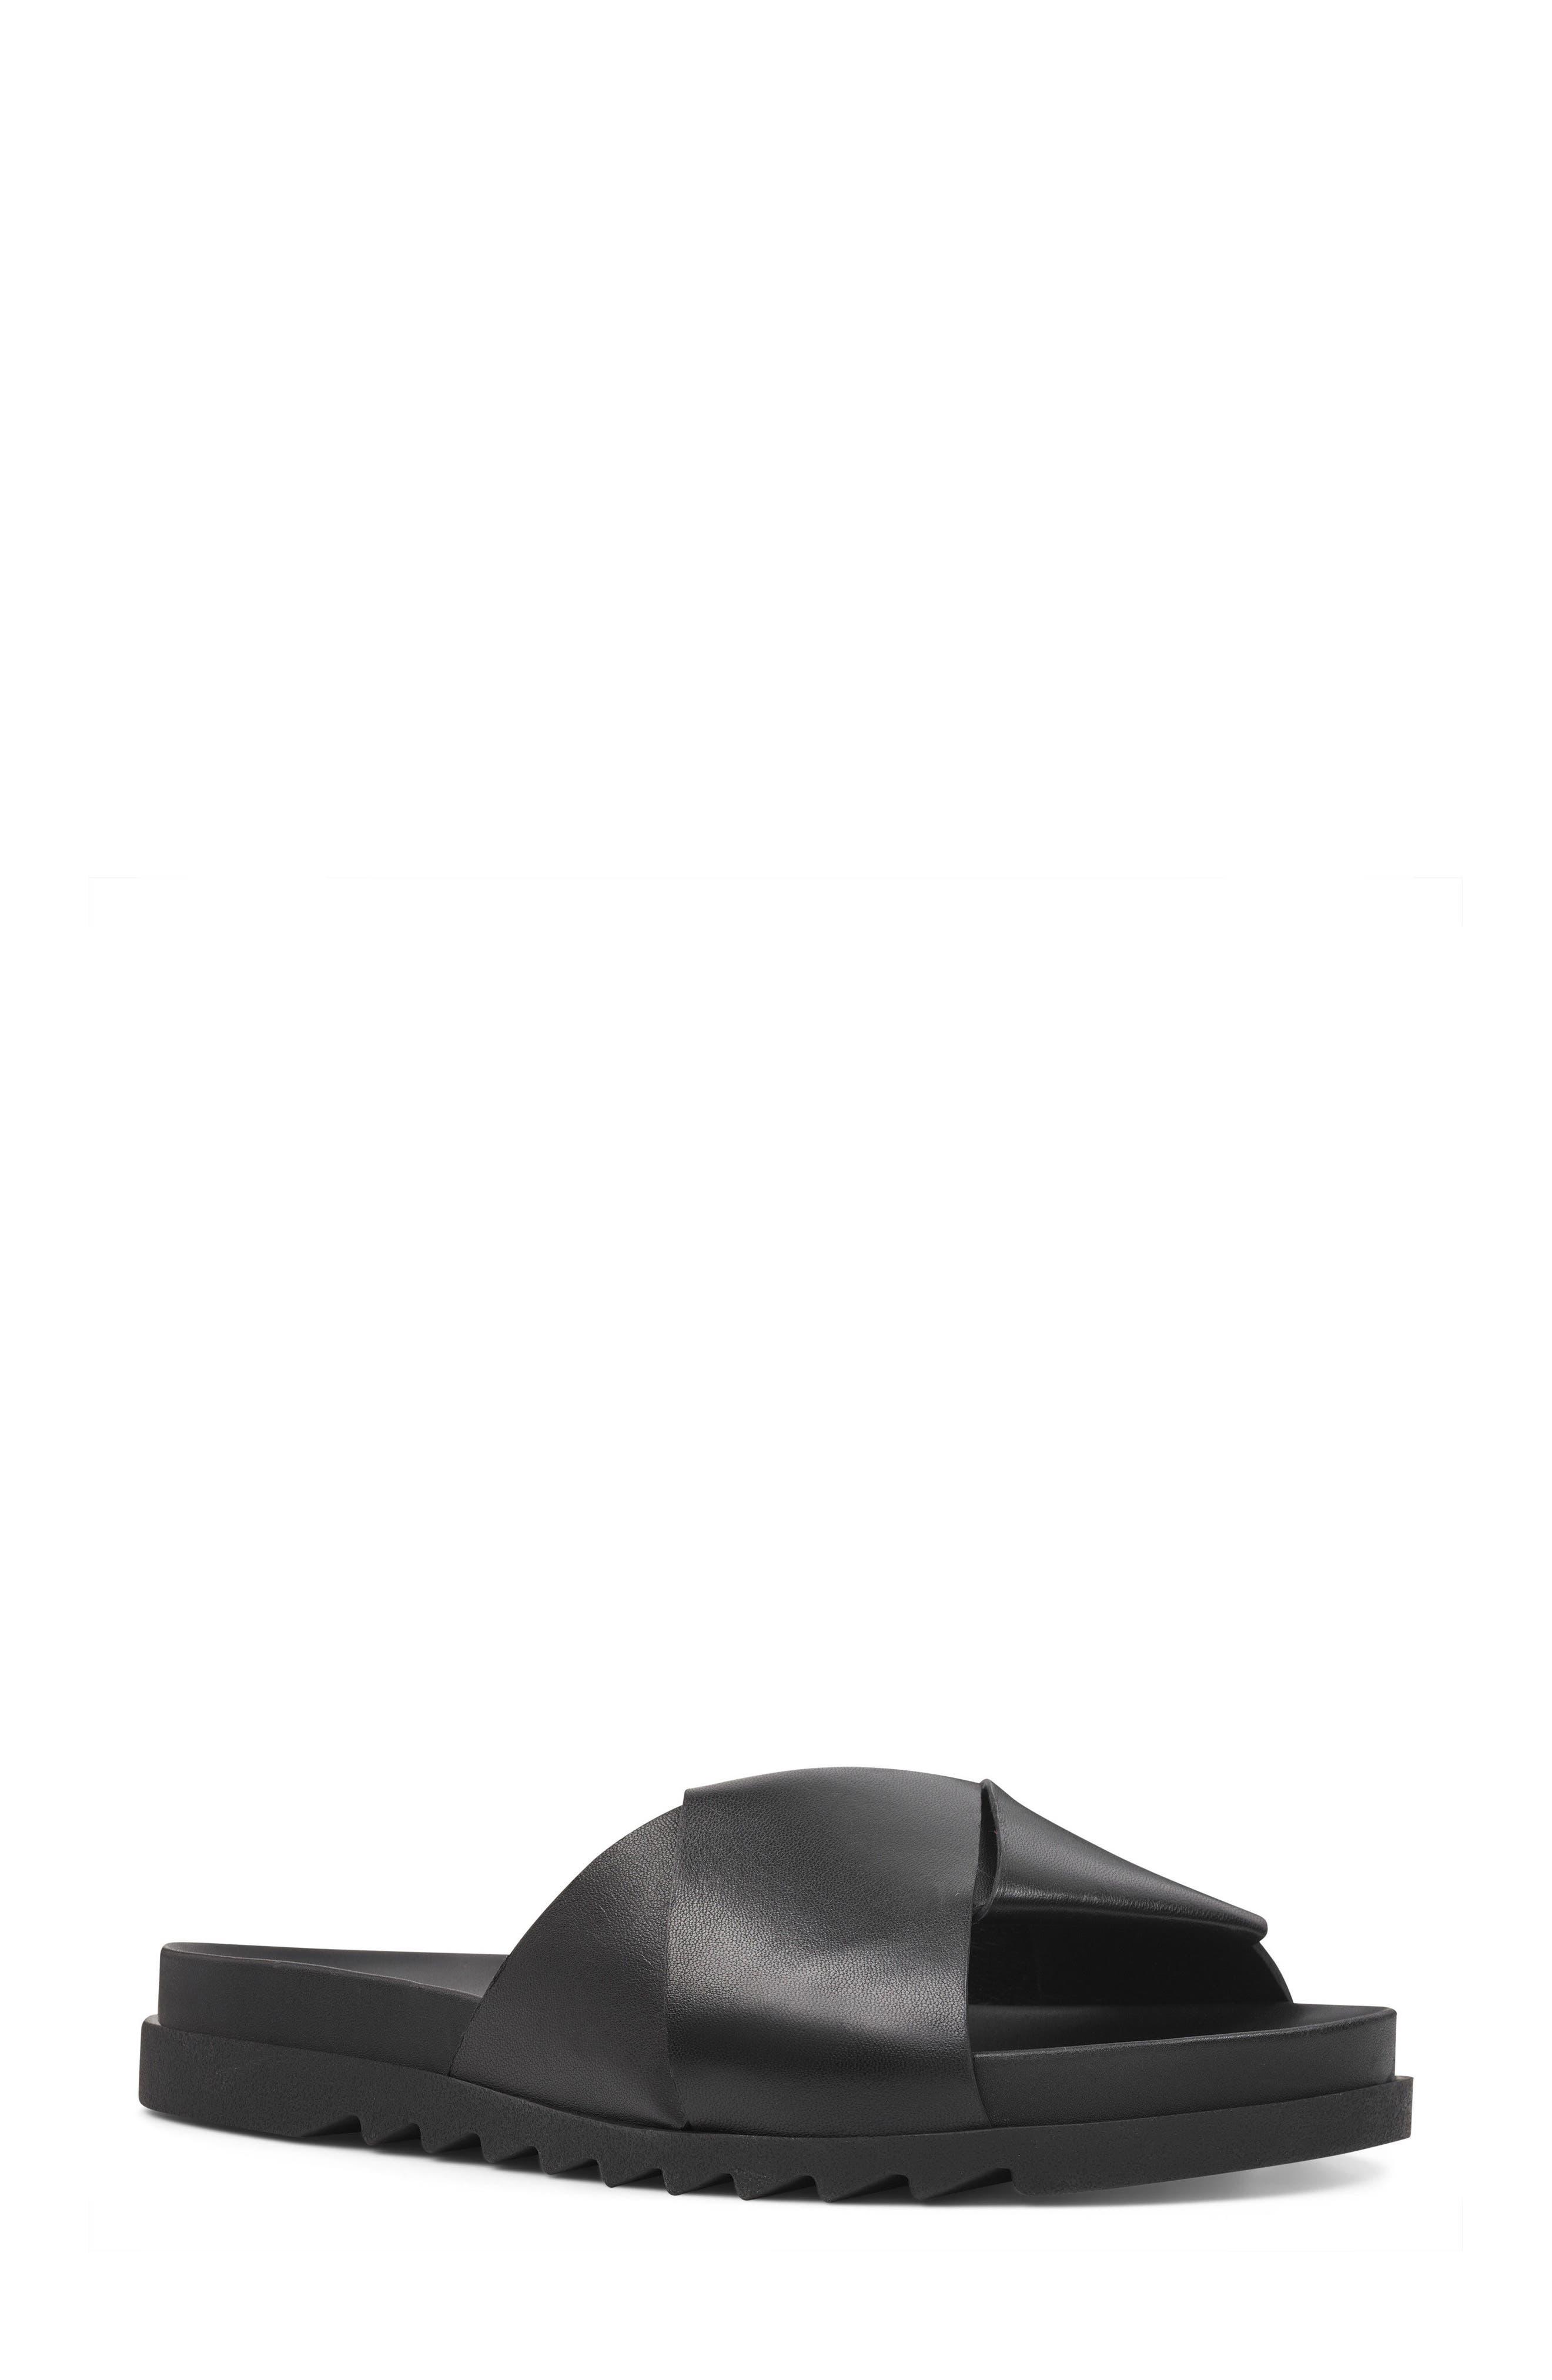 Furaish Slide Sandal,                         Main,                         color, 001